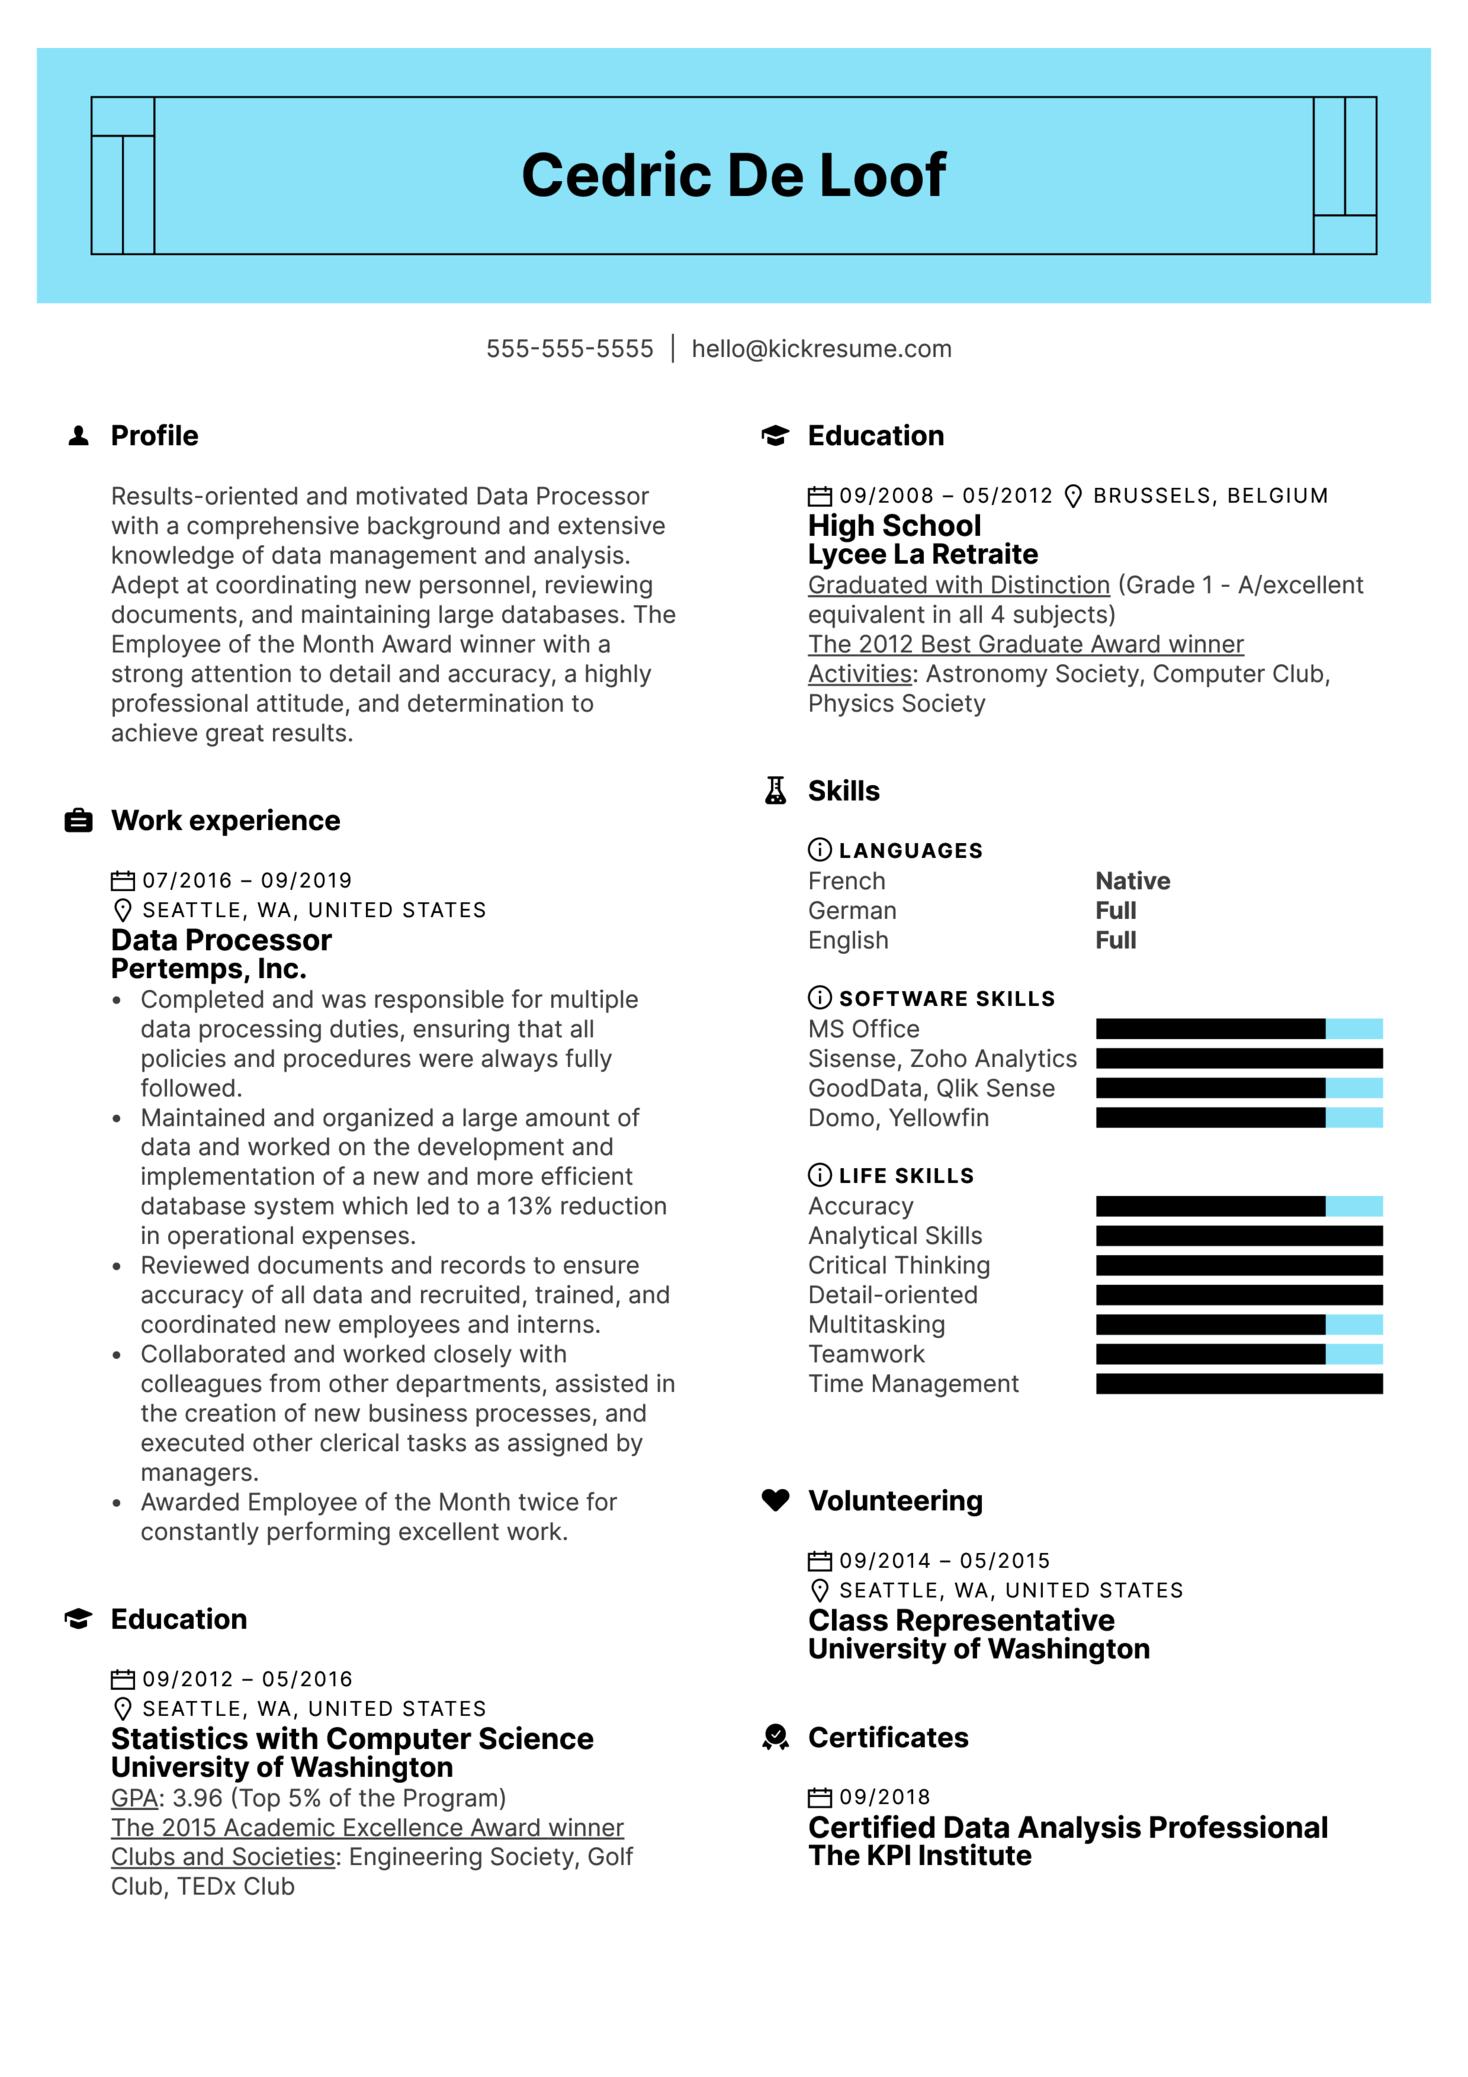 Data Processor Resume Example (Parte 1)